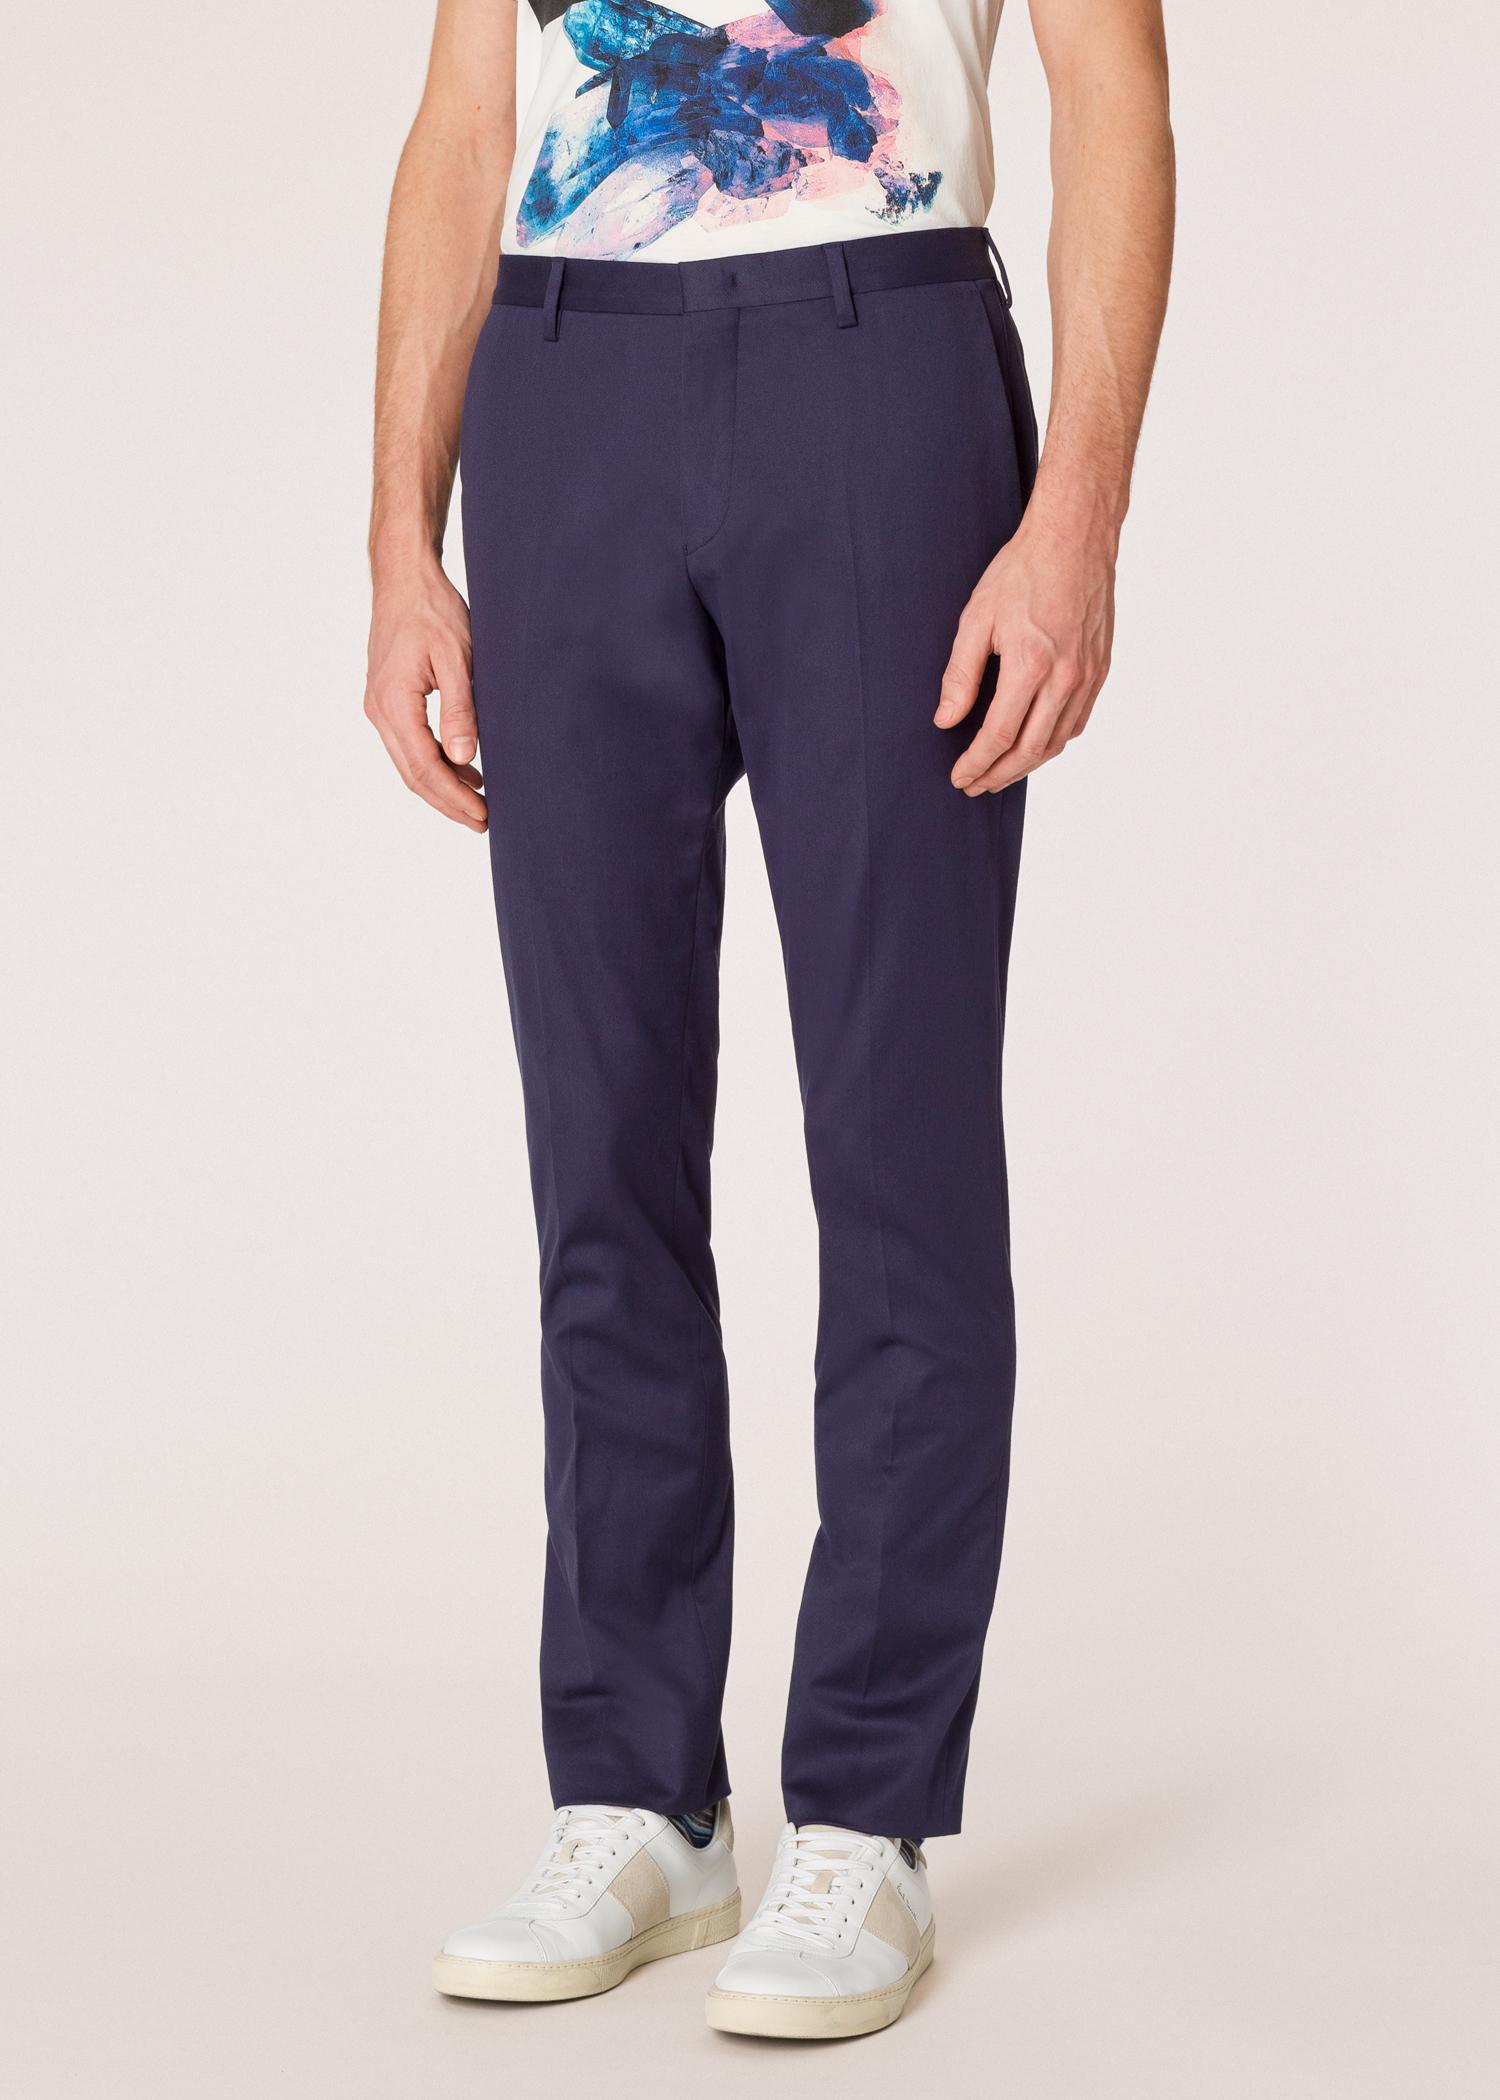 1b3337c4c4 Men's Slim-Fit Navy Stretch-Cotton Chinos